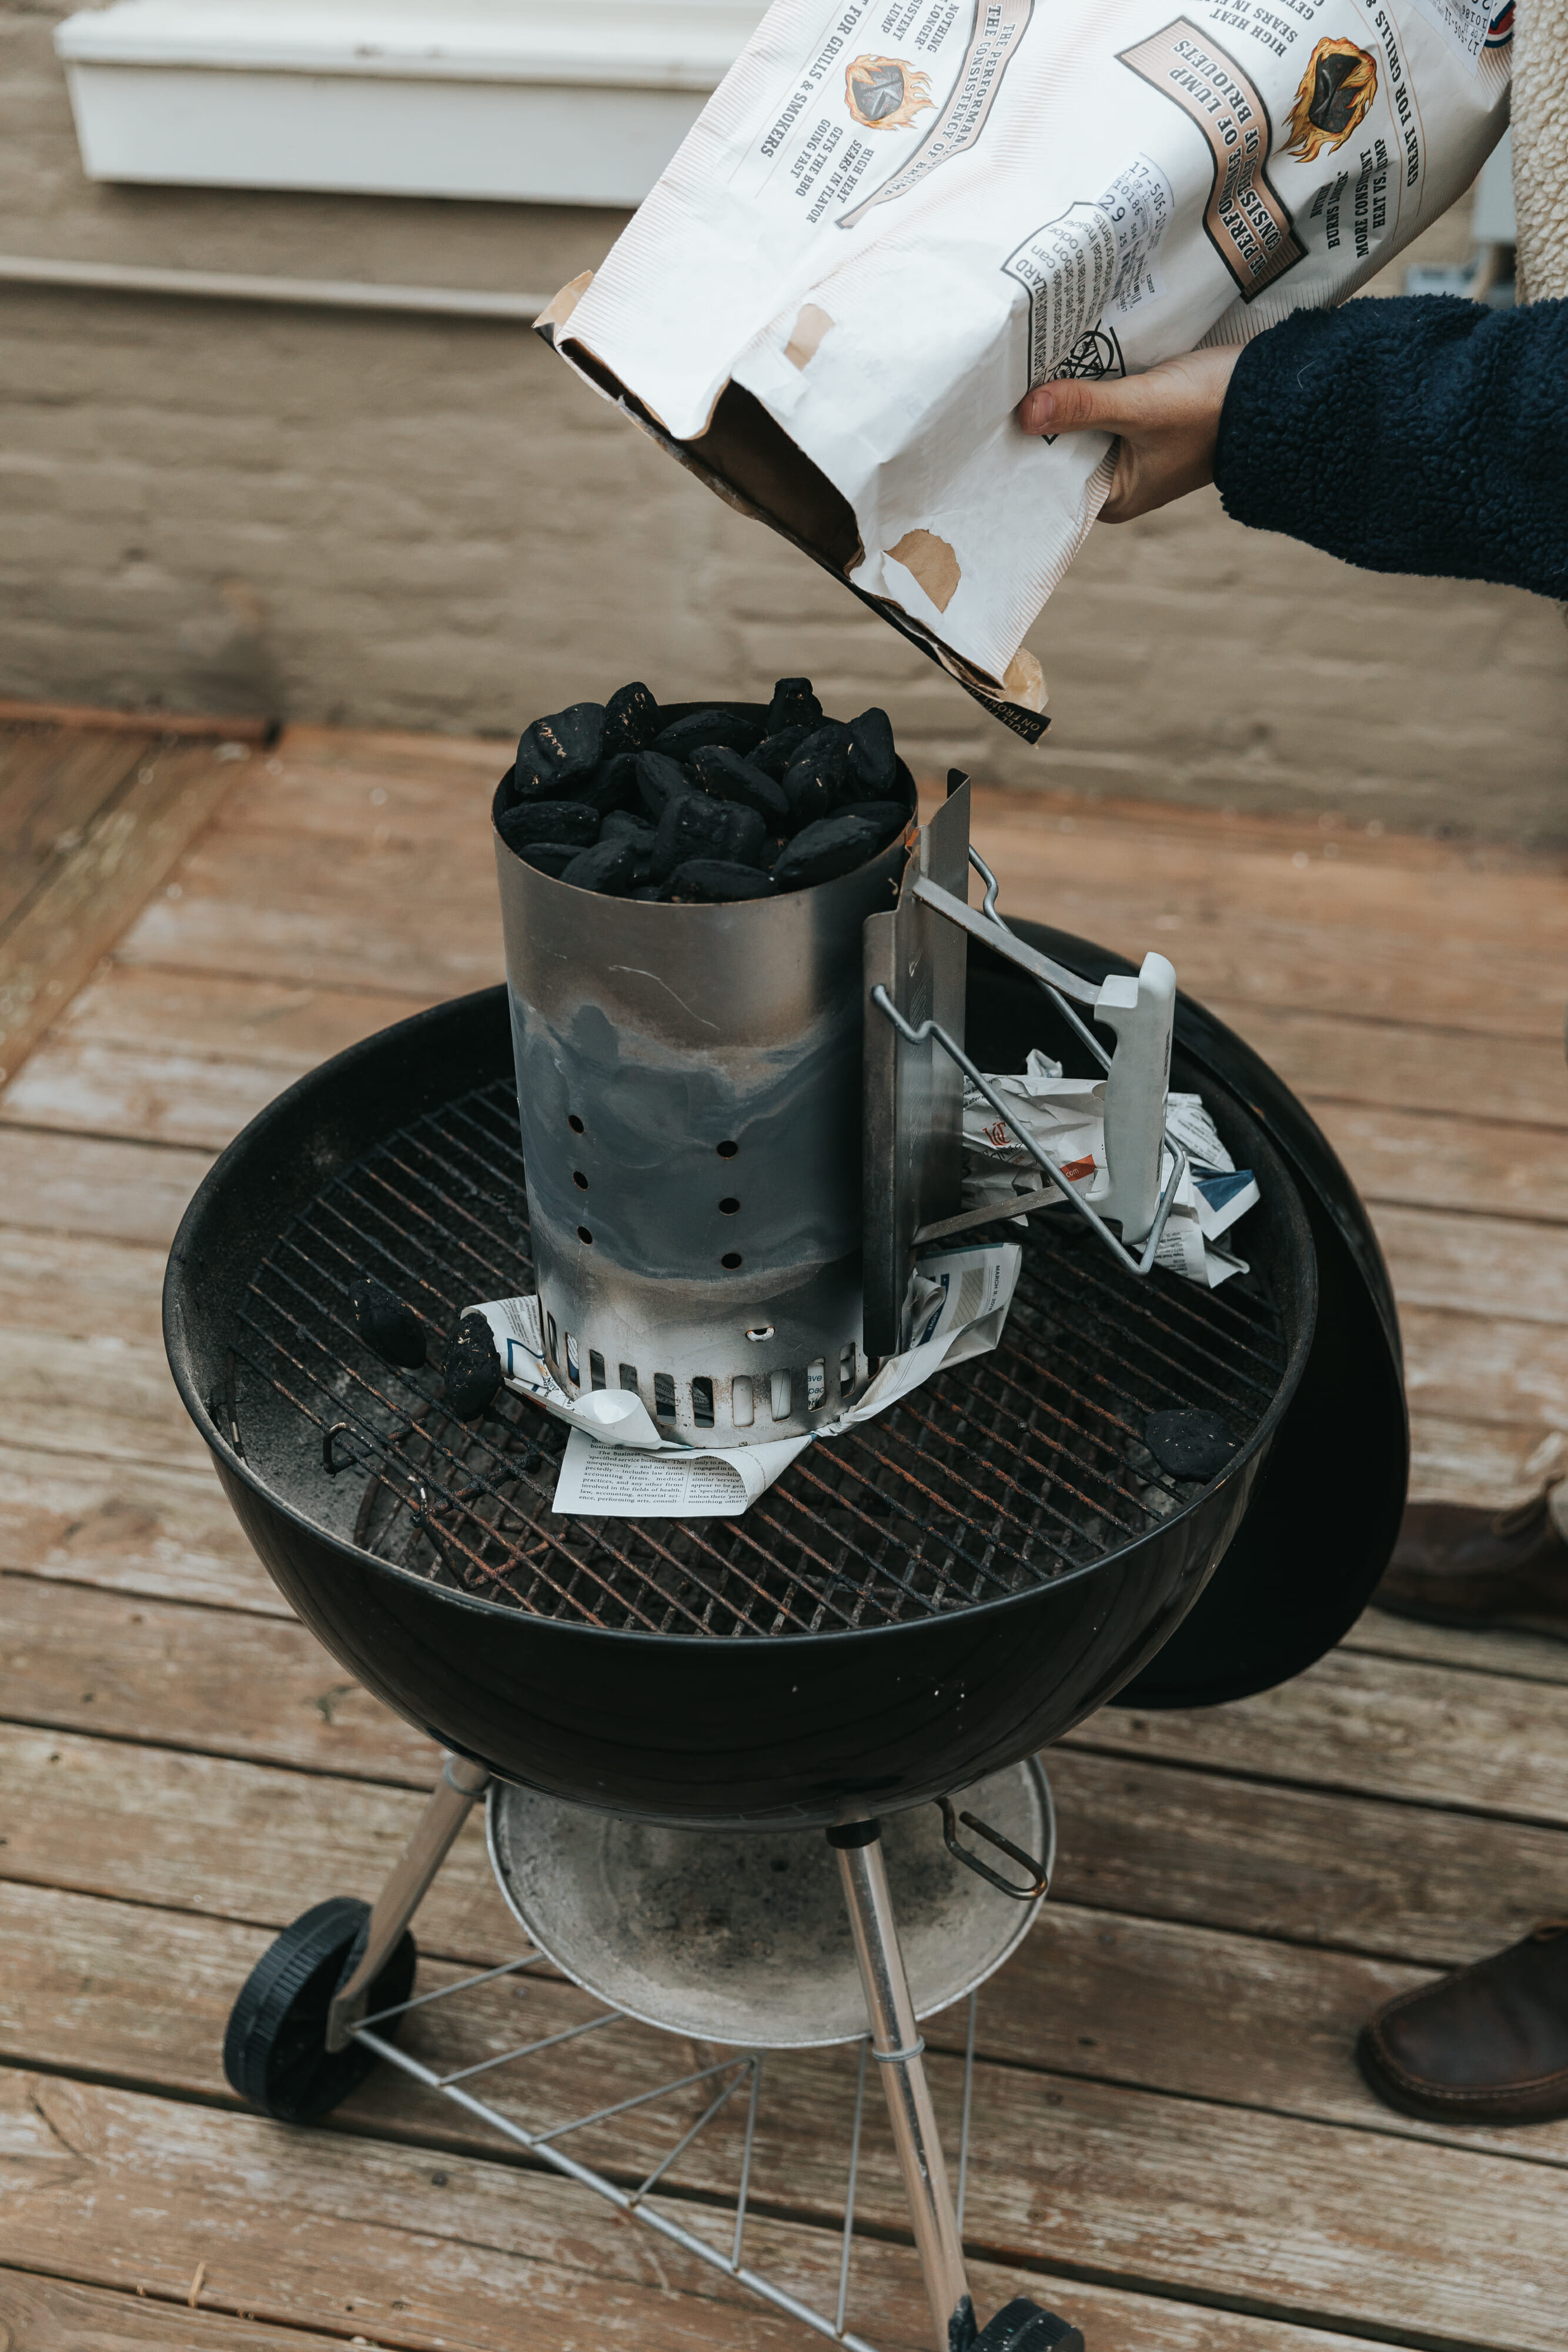 man preparing grill